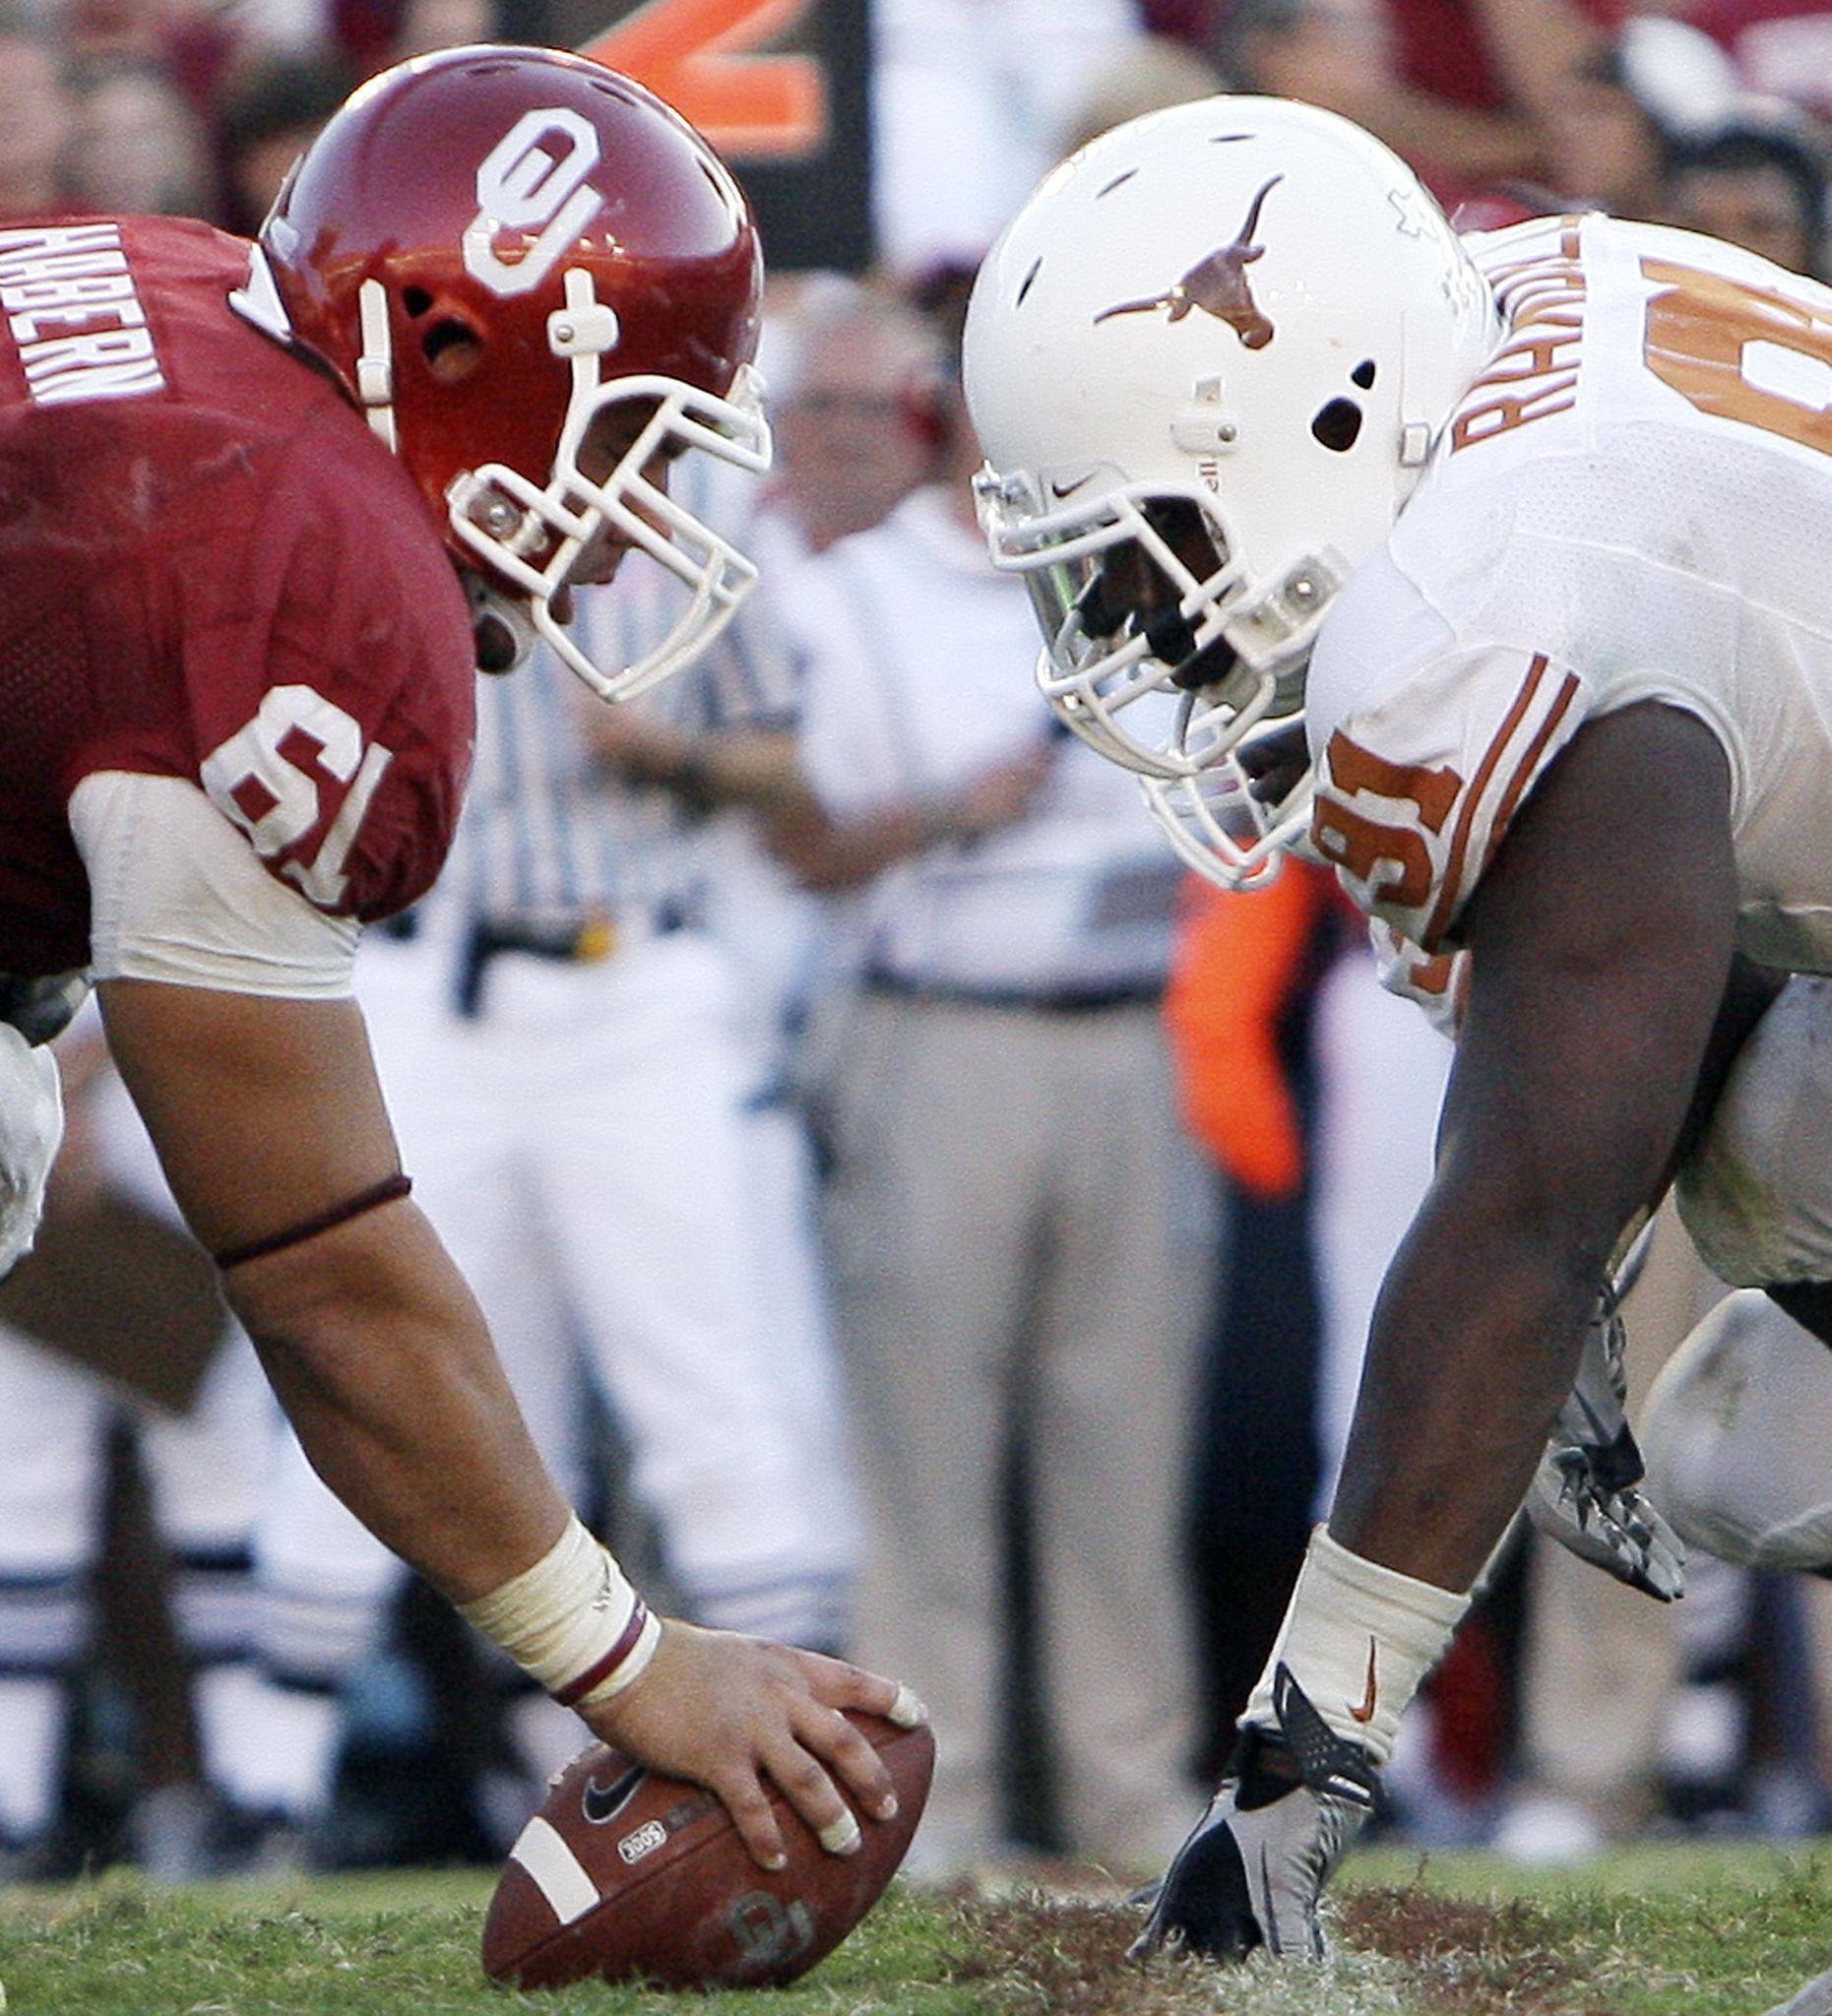 Championship Saturday: Oklahoma, Ohio State make CFP case ...